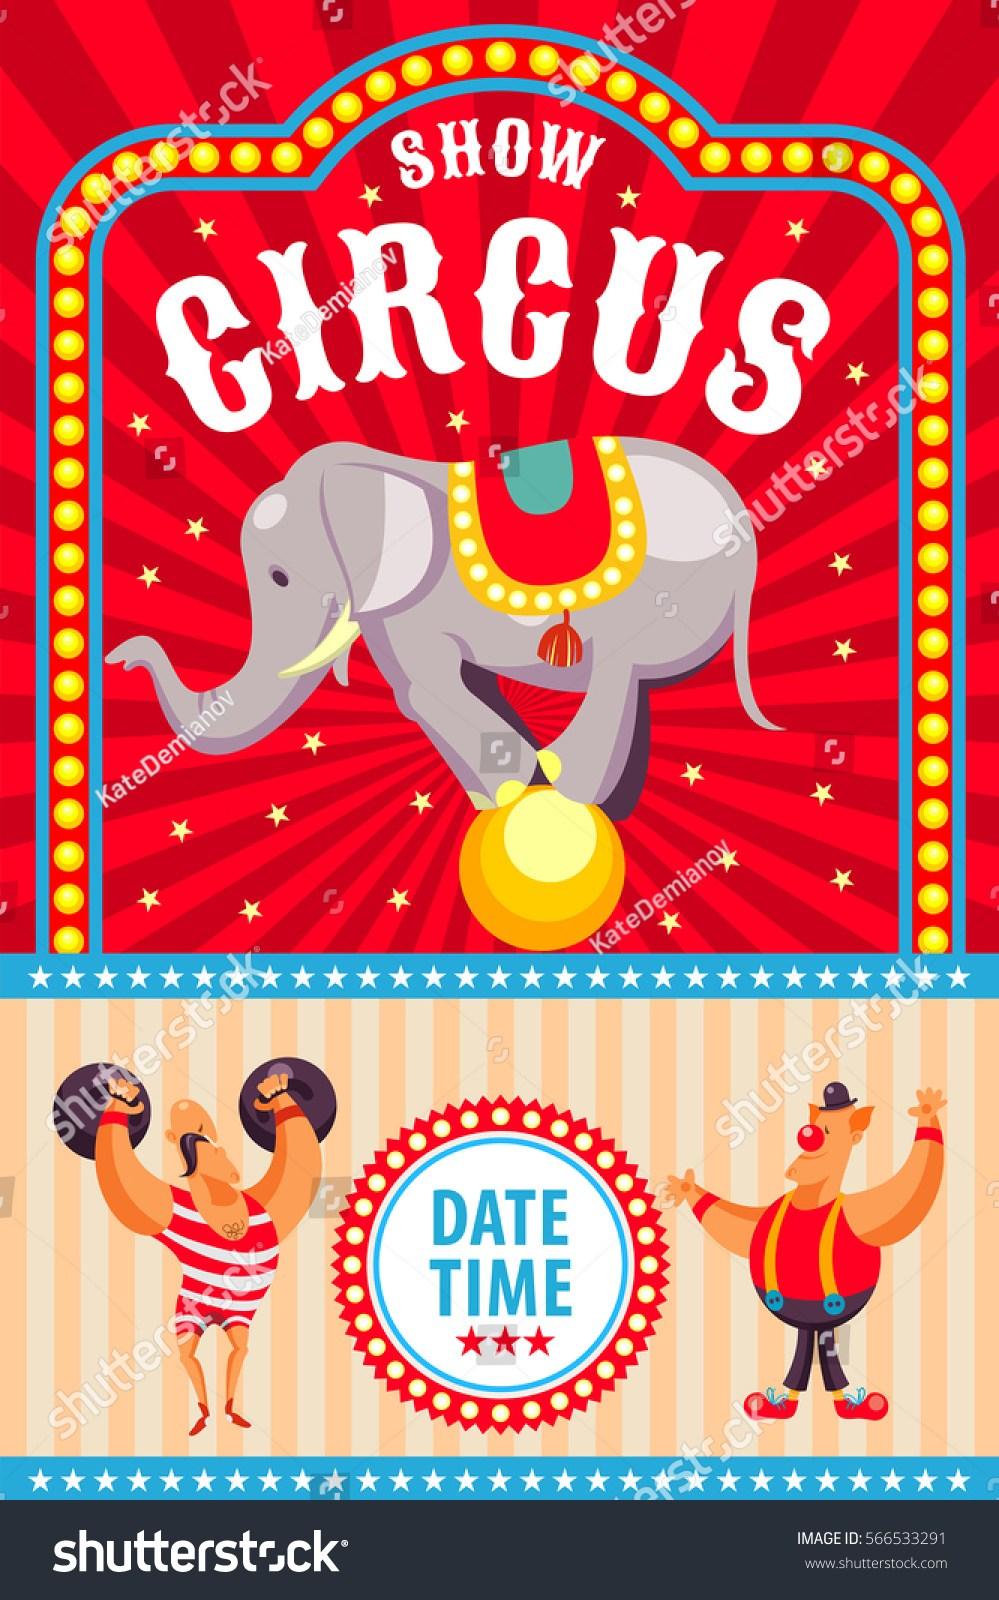 Circus poster clipart 9 » Clipart Portal.